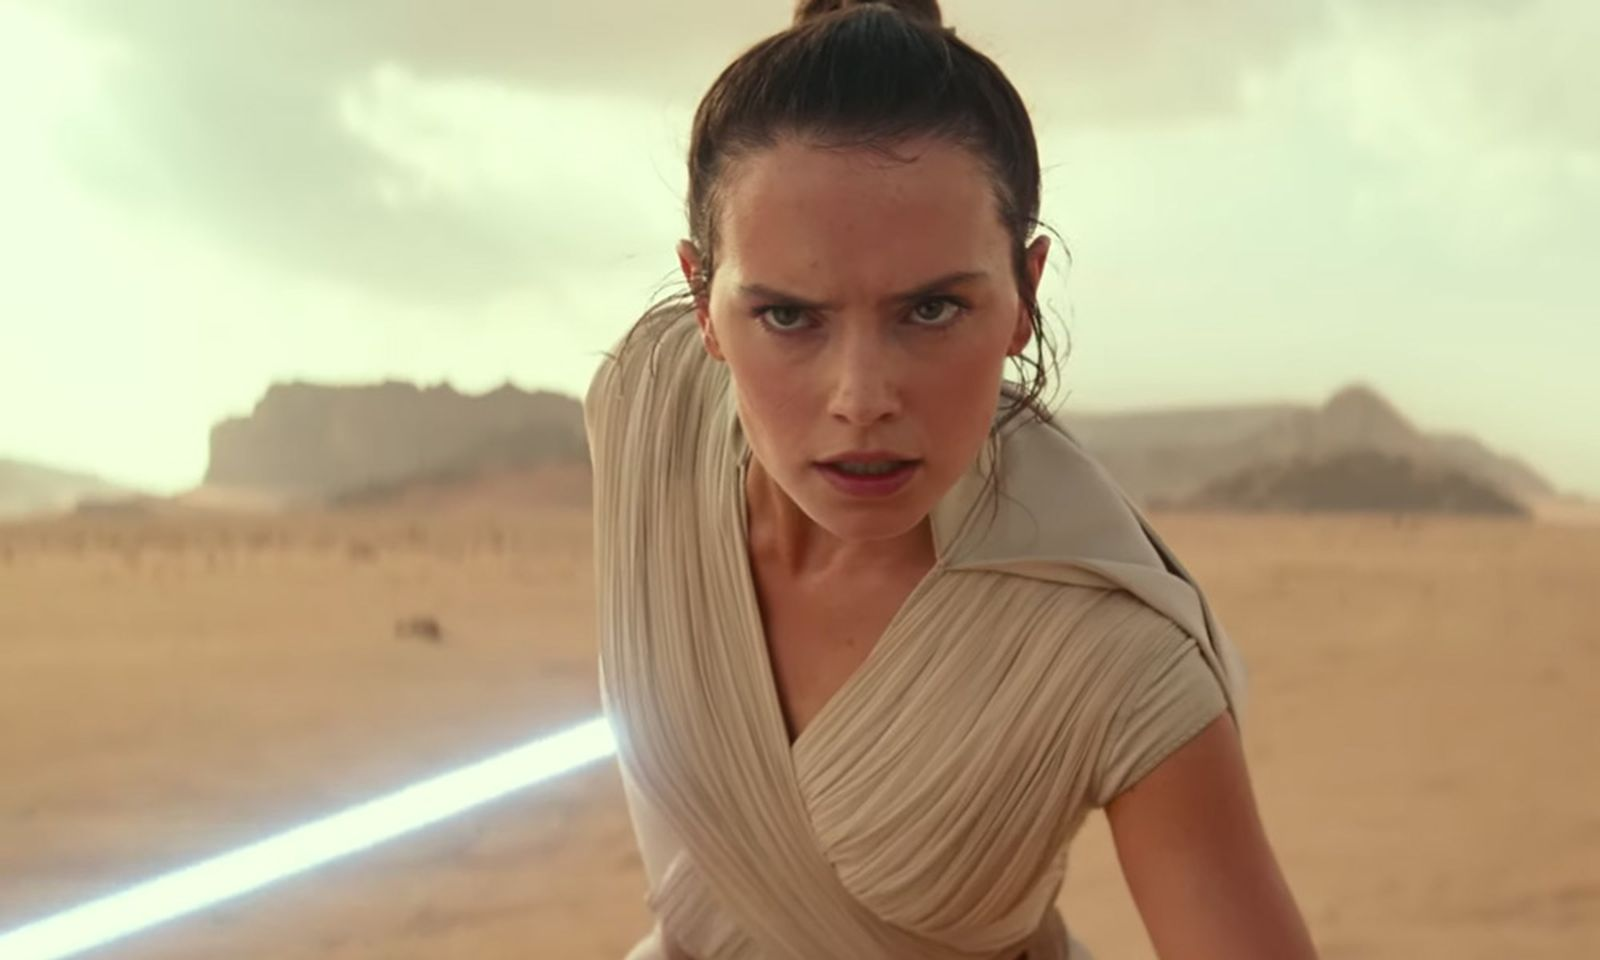 Star Wars: The Rise of Skywalker closeup in desert with lightsaber